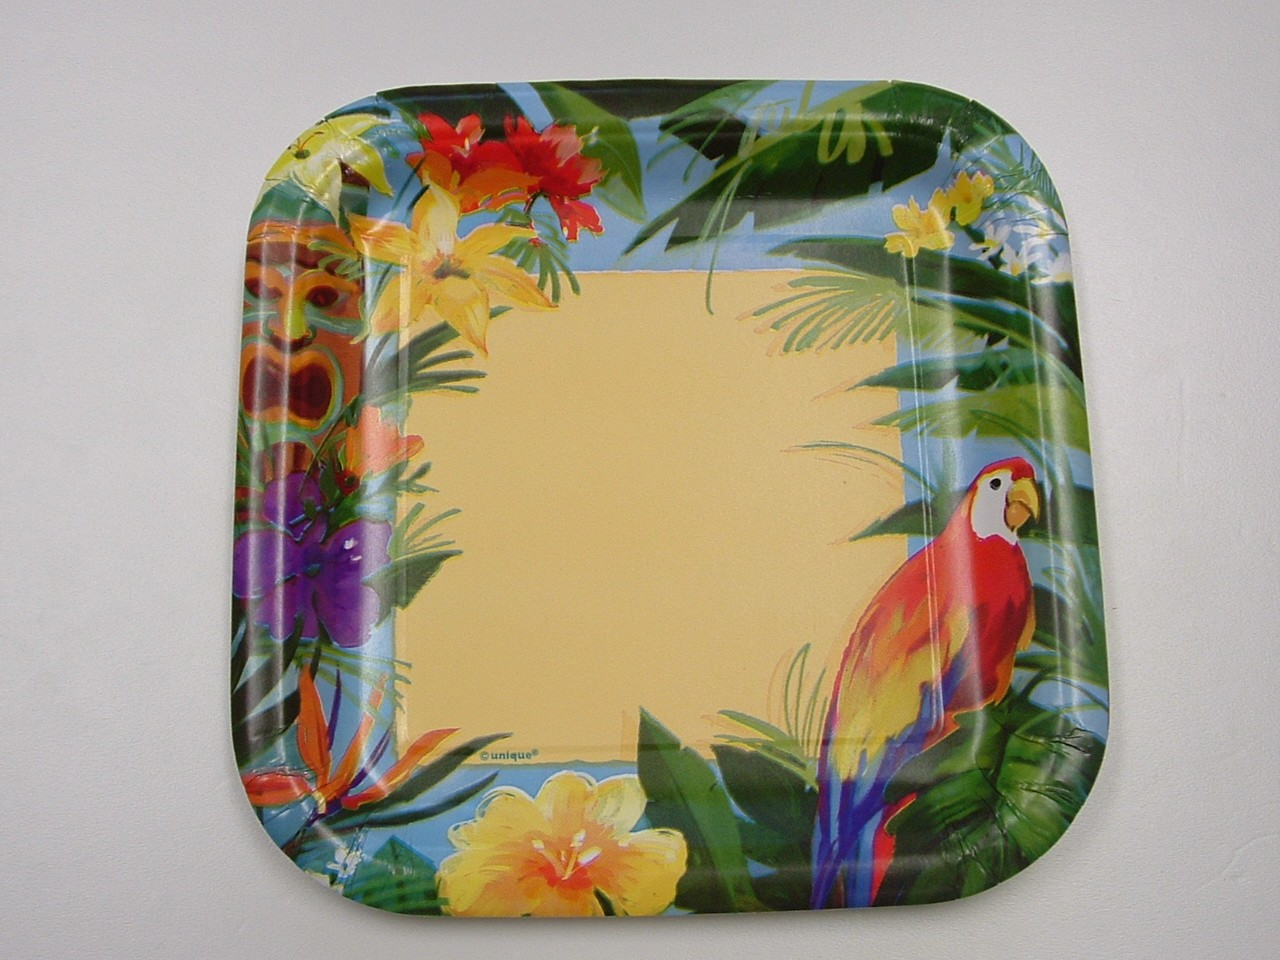 tiki tropics luau party paper plates napkins cups table cover ebay. Black Bedroom Furniture Sets. Home Design Ideas